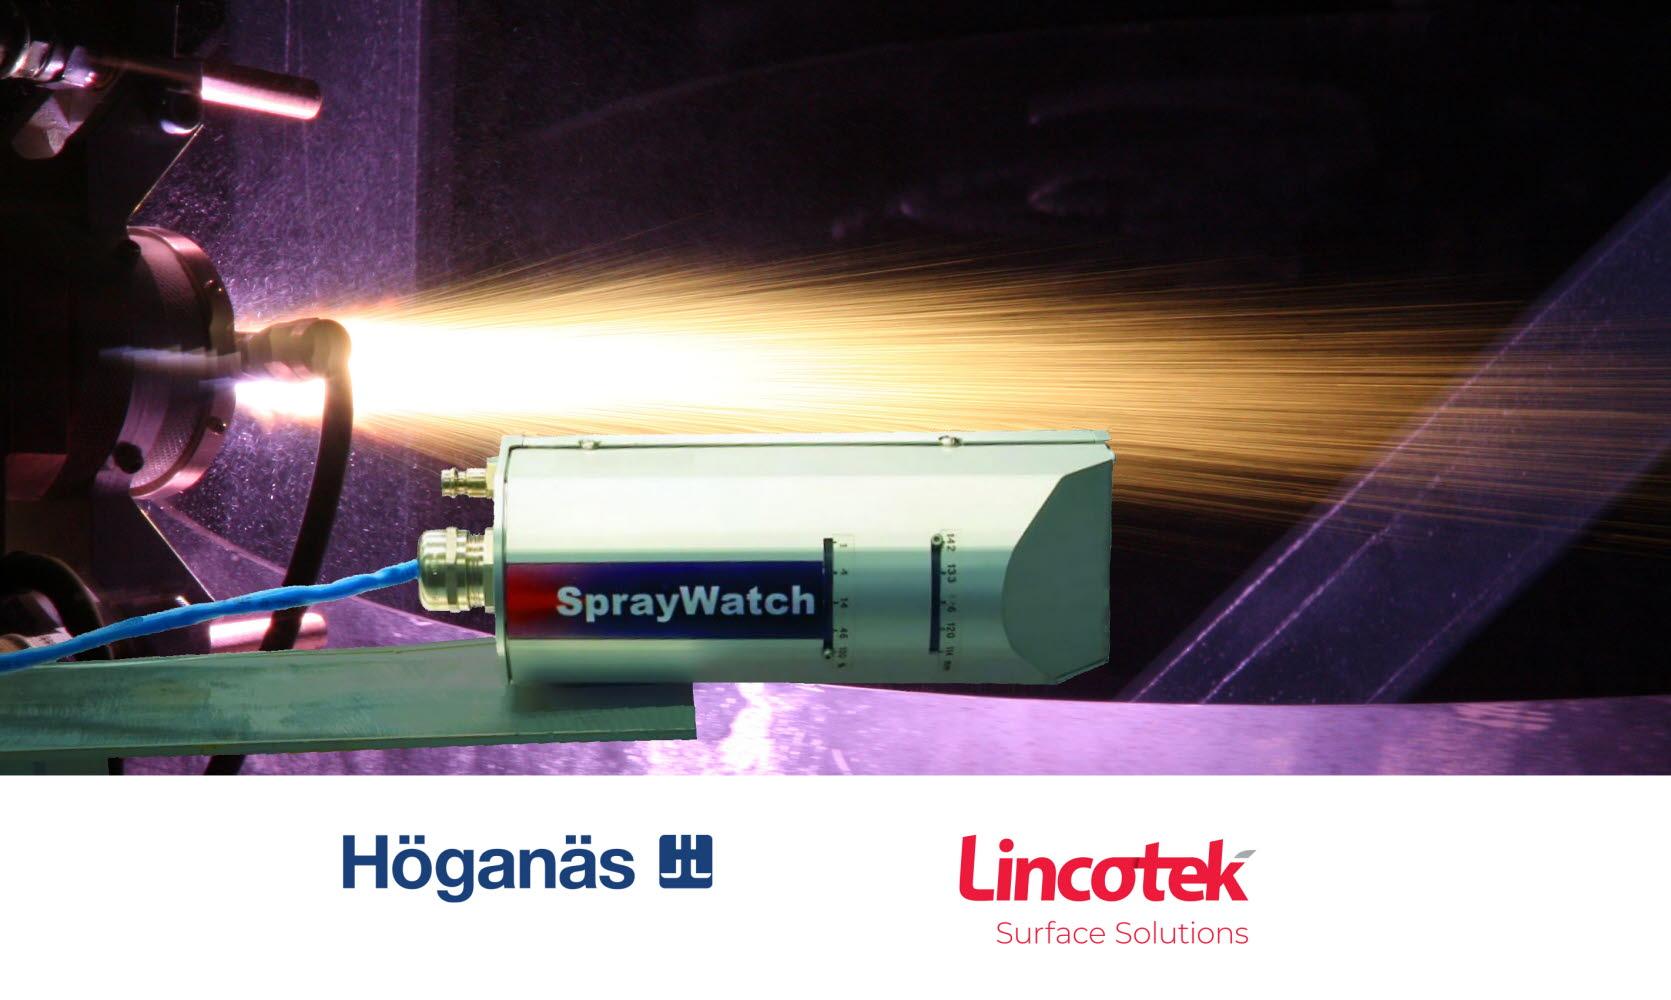 Höganäs and Lincotek sign cooperation agreement